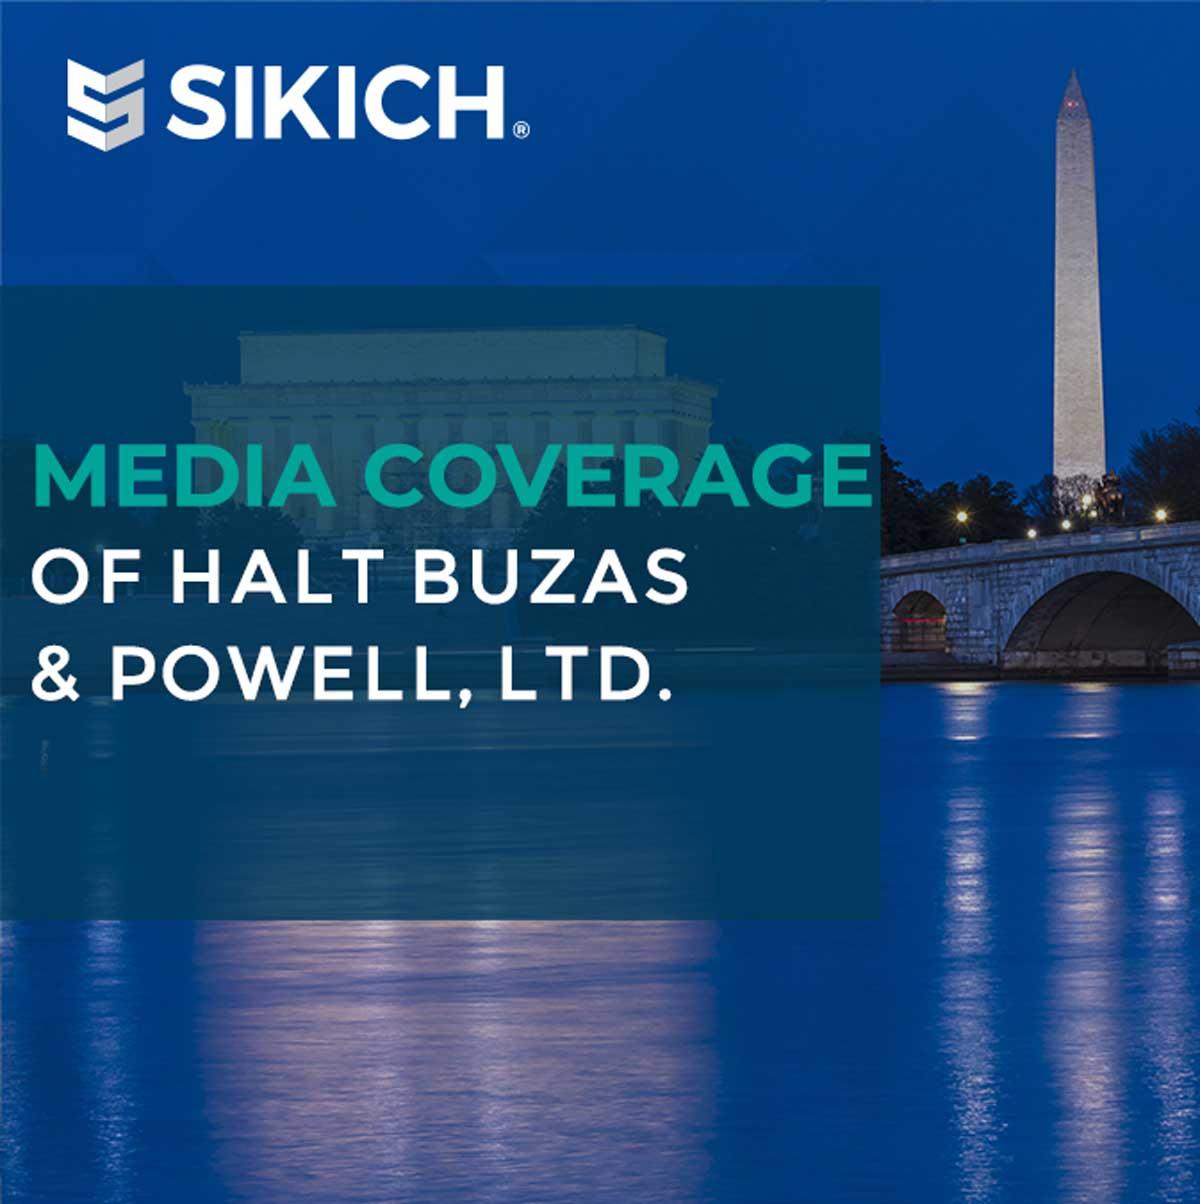 Media-coverage-of-Halt-acquisition-Square-12.18.19